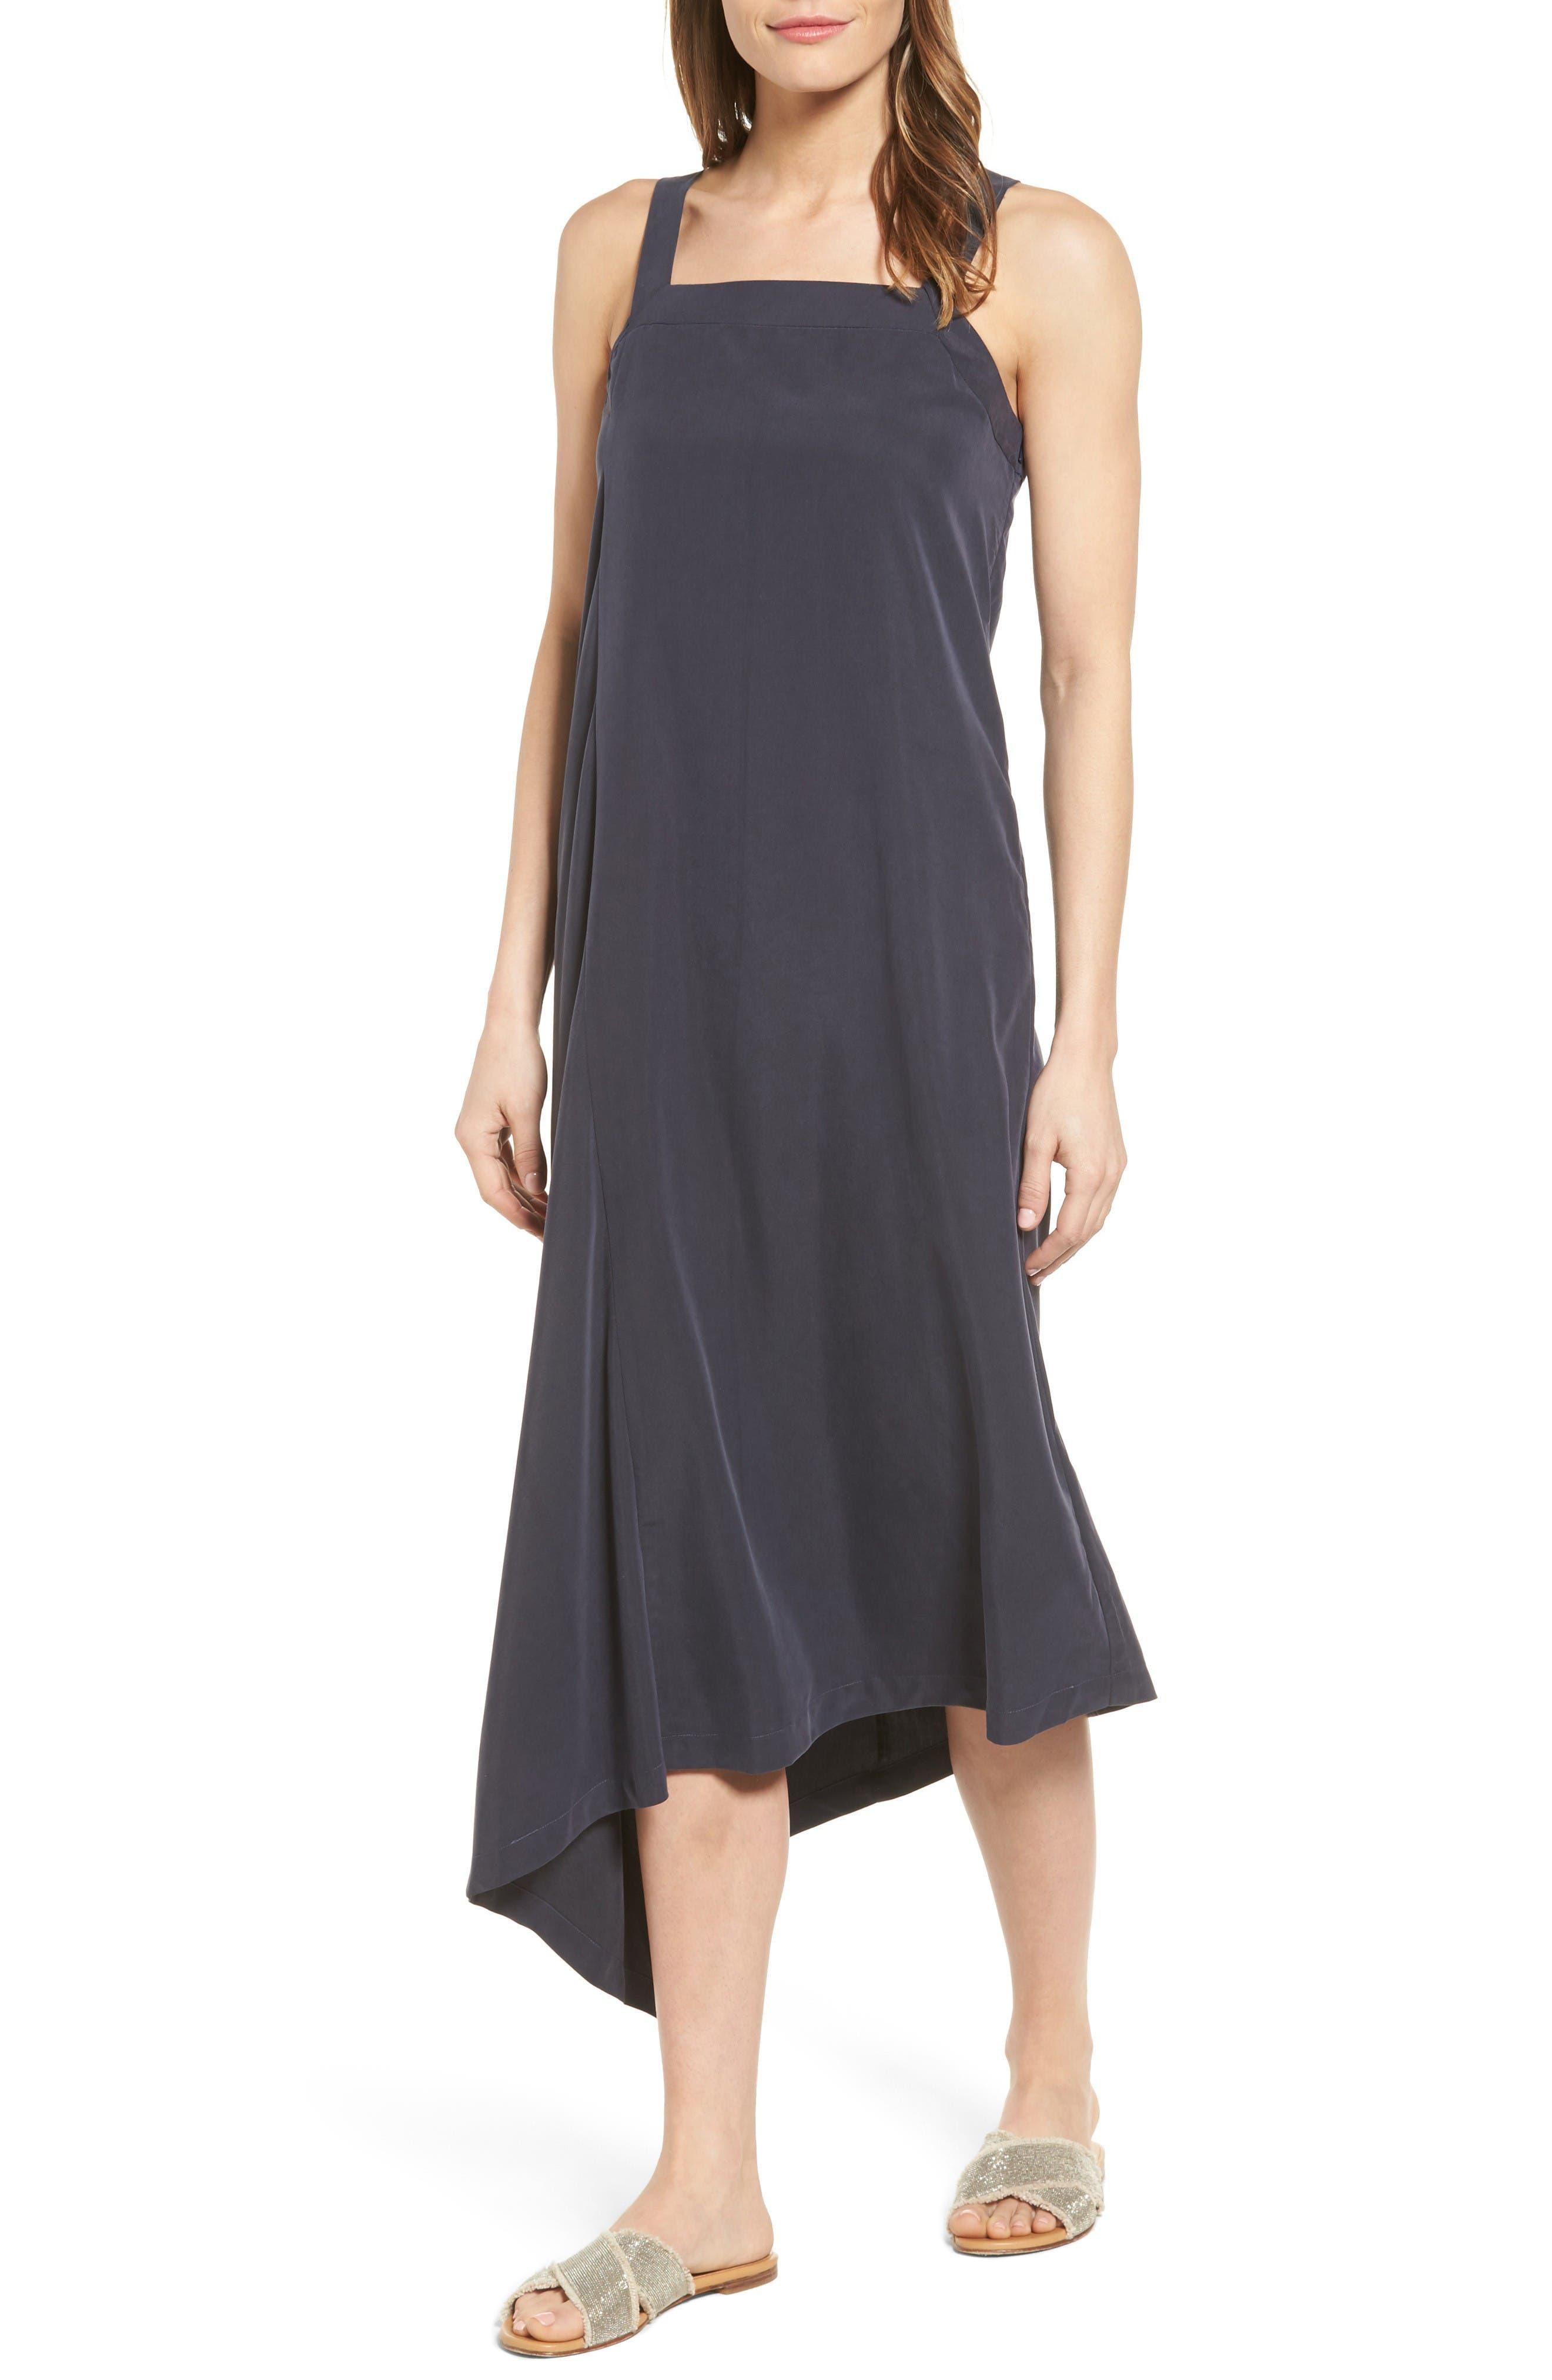 Alternate Image 1 Selected - NIC+ZOE City Slicker Asymmetrical Midi Dress (Regular & Petite)